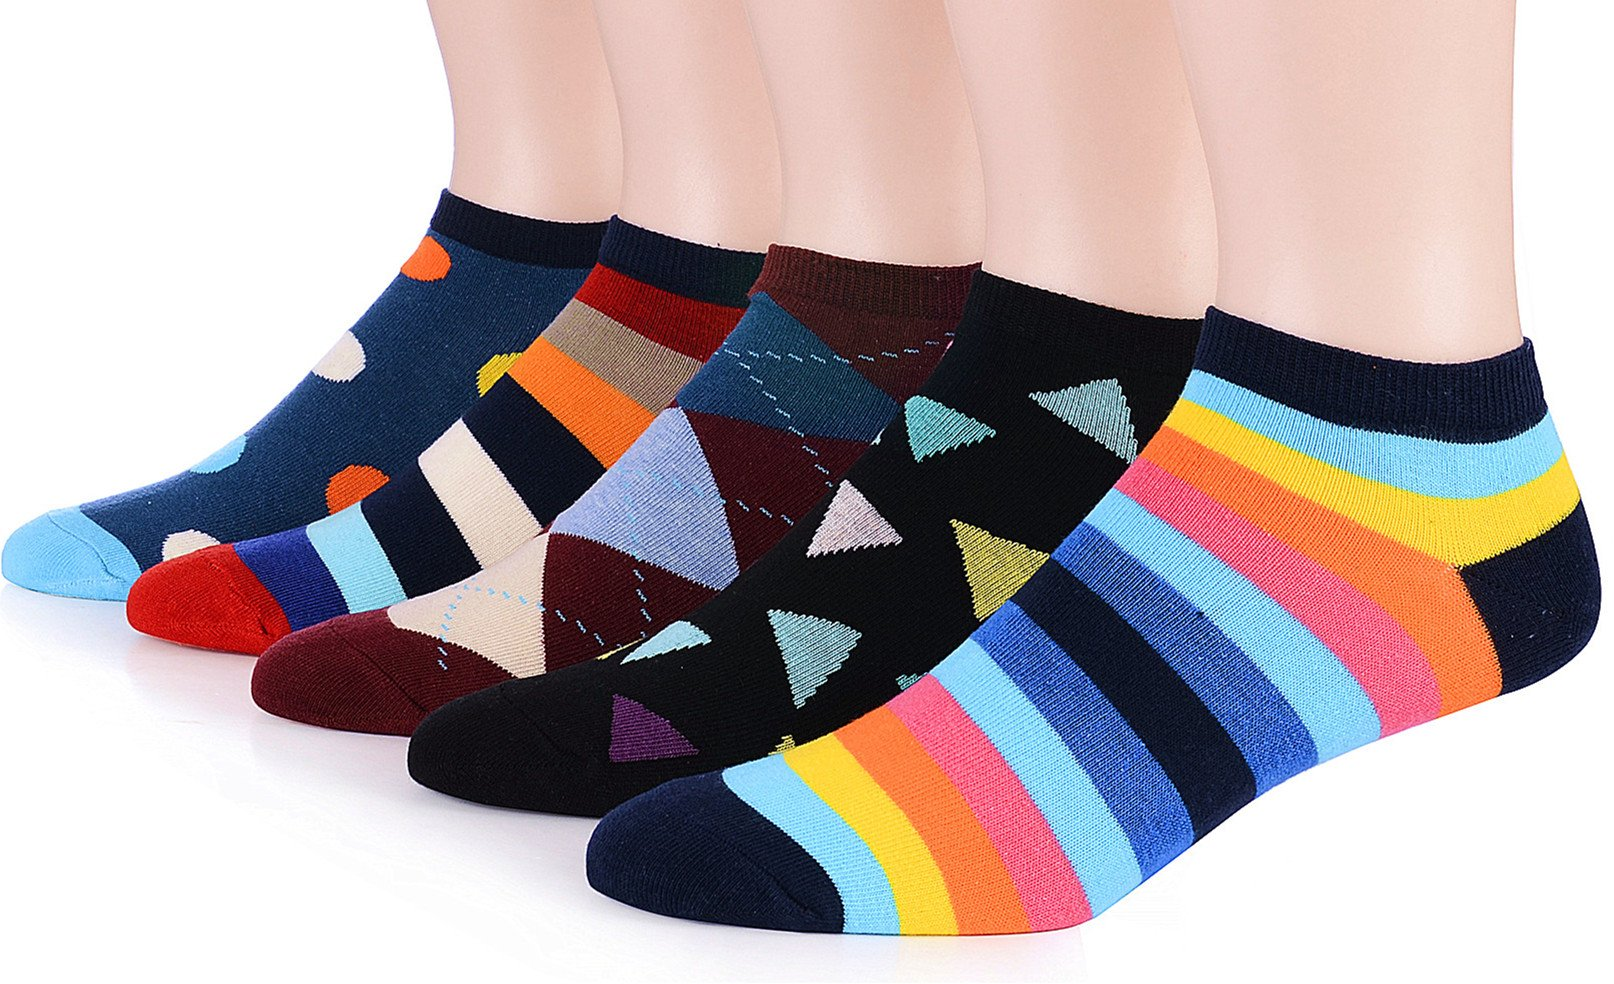 Dr. Anison Men Cotton Low Cut Socks Fashion color Stripe For Spring Summer Pack Of 3 (Normal, M-6601)